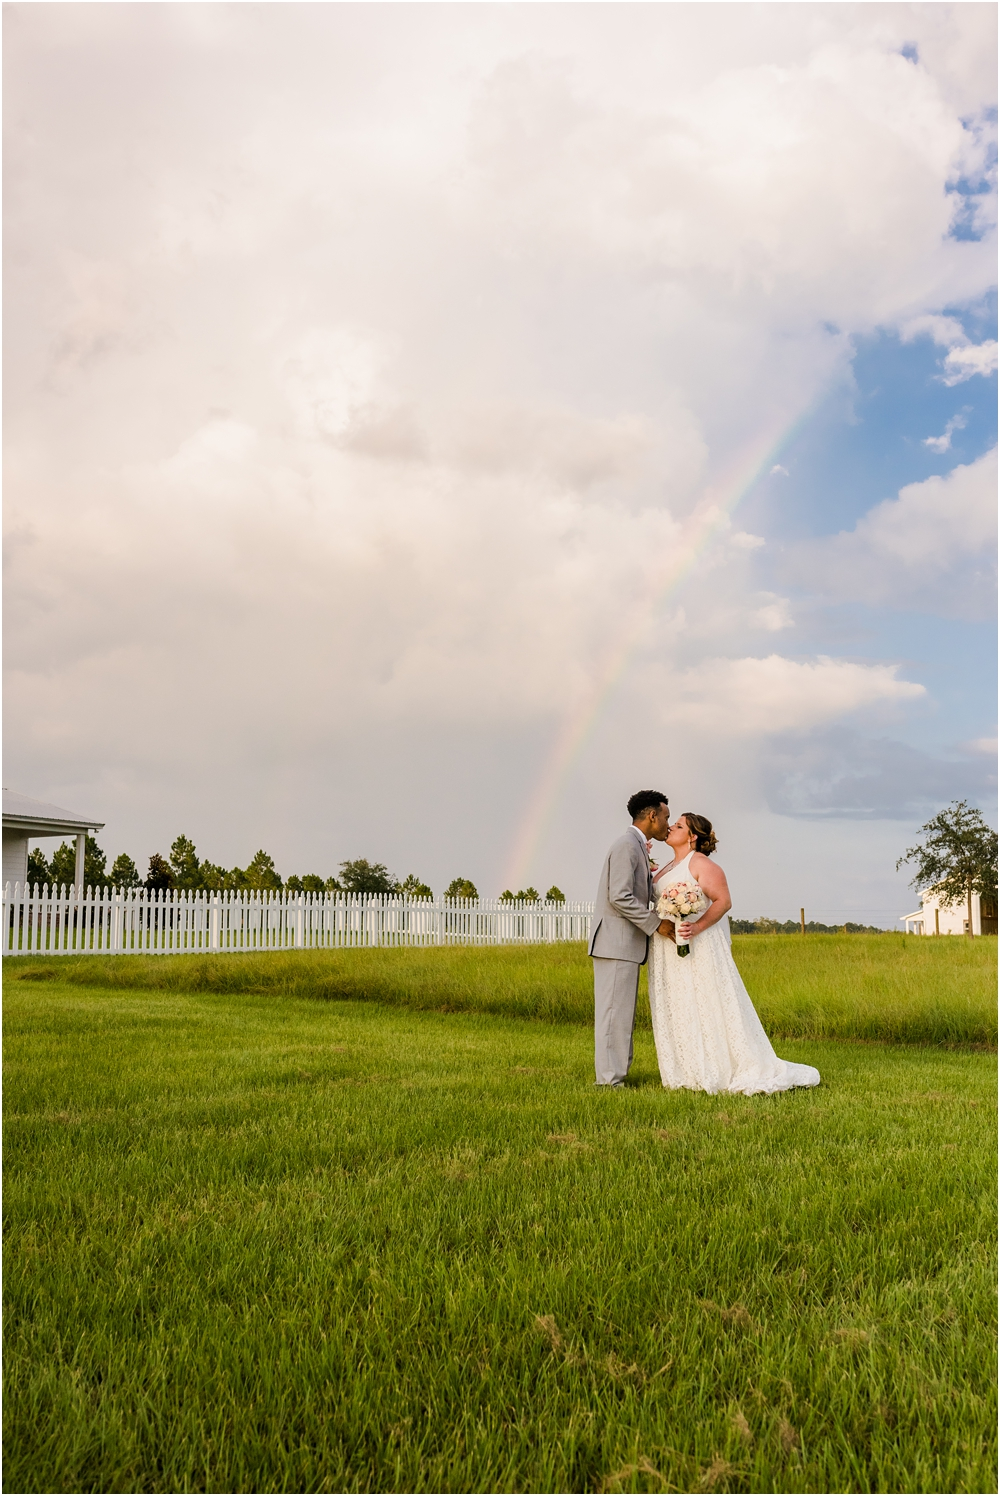 mosley-wedding-kiersten-stevenson-photography-30a-panama-city-beach-dothan-tallahassee-(233-of-472).JPG